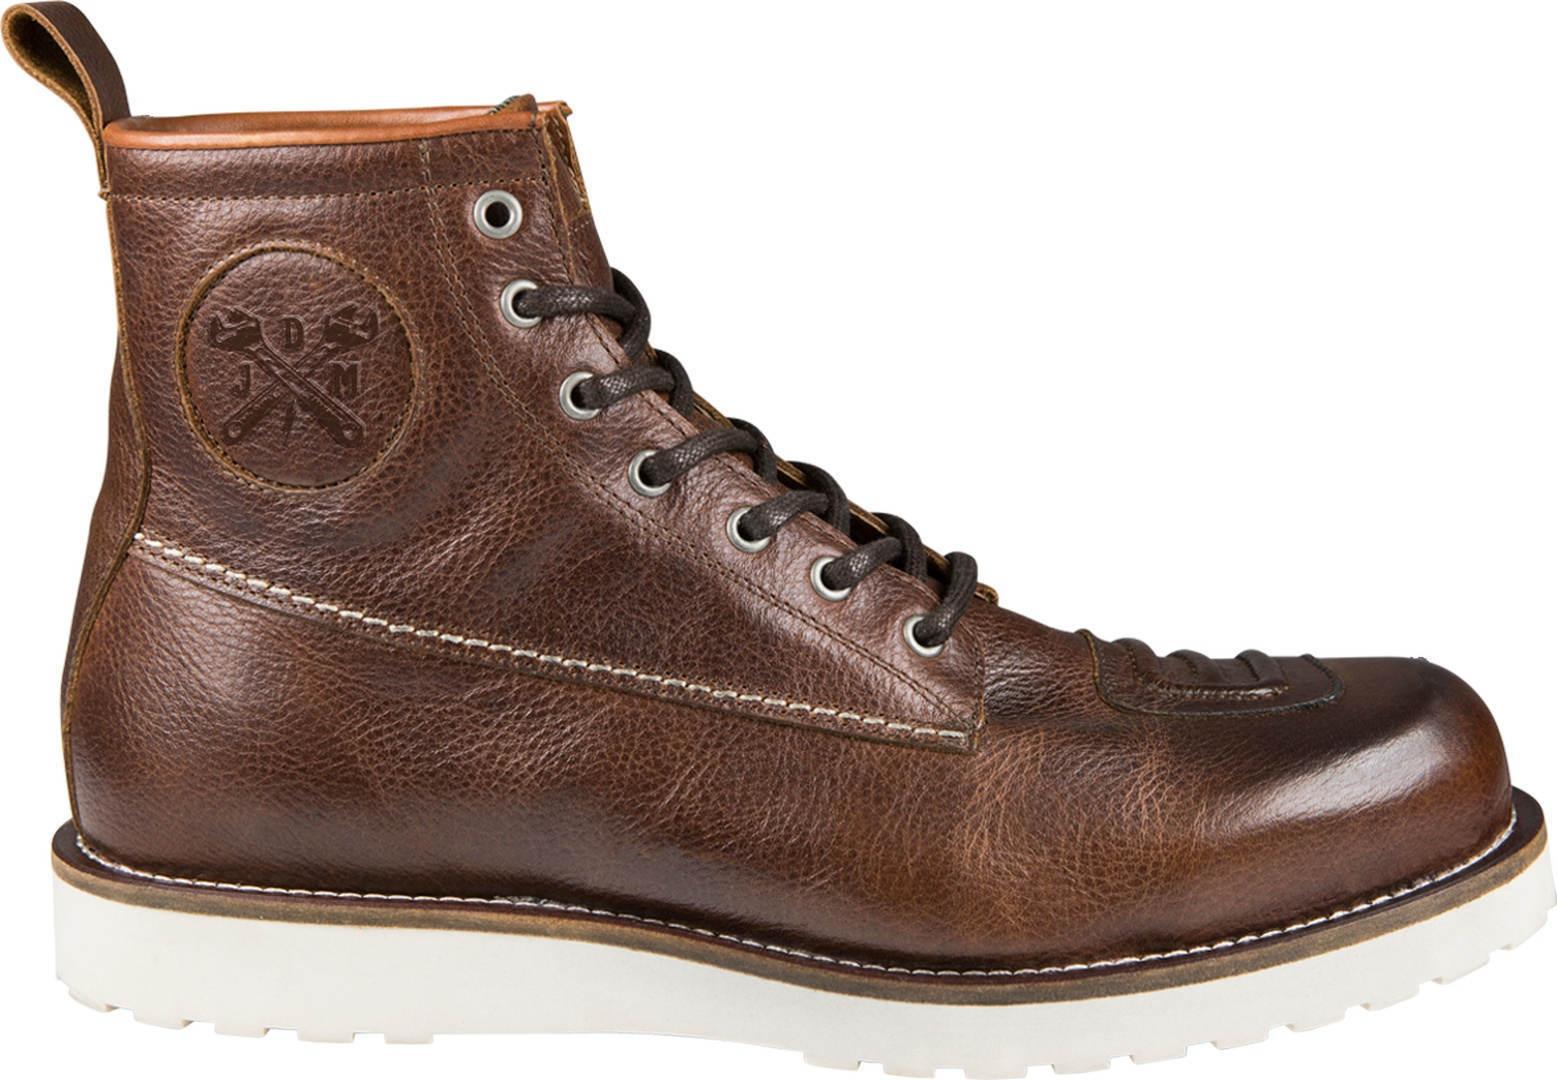 John Doe Iron XTM Motorcycle Shoes  - Brown - Size: 43